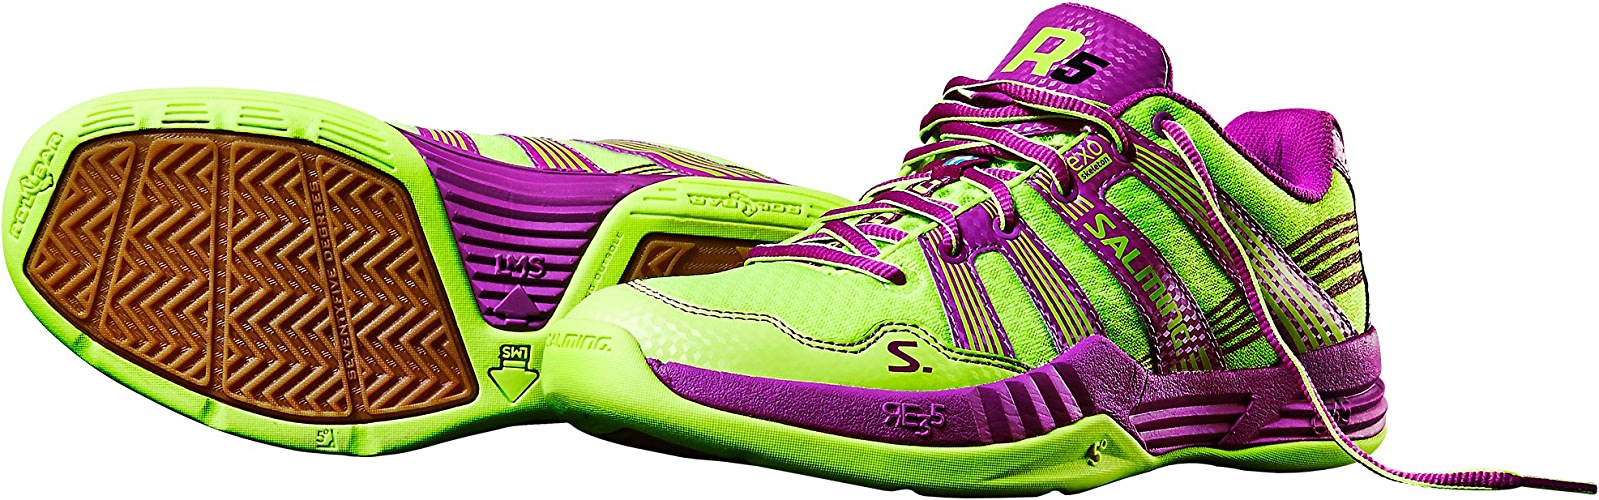 Chaussures Salming Race R5 jaune violet-42